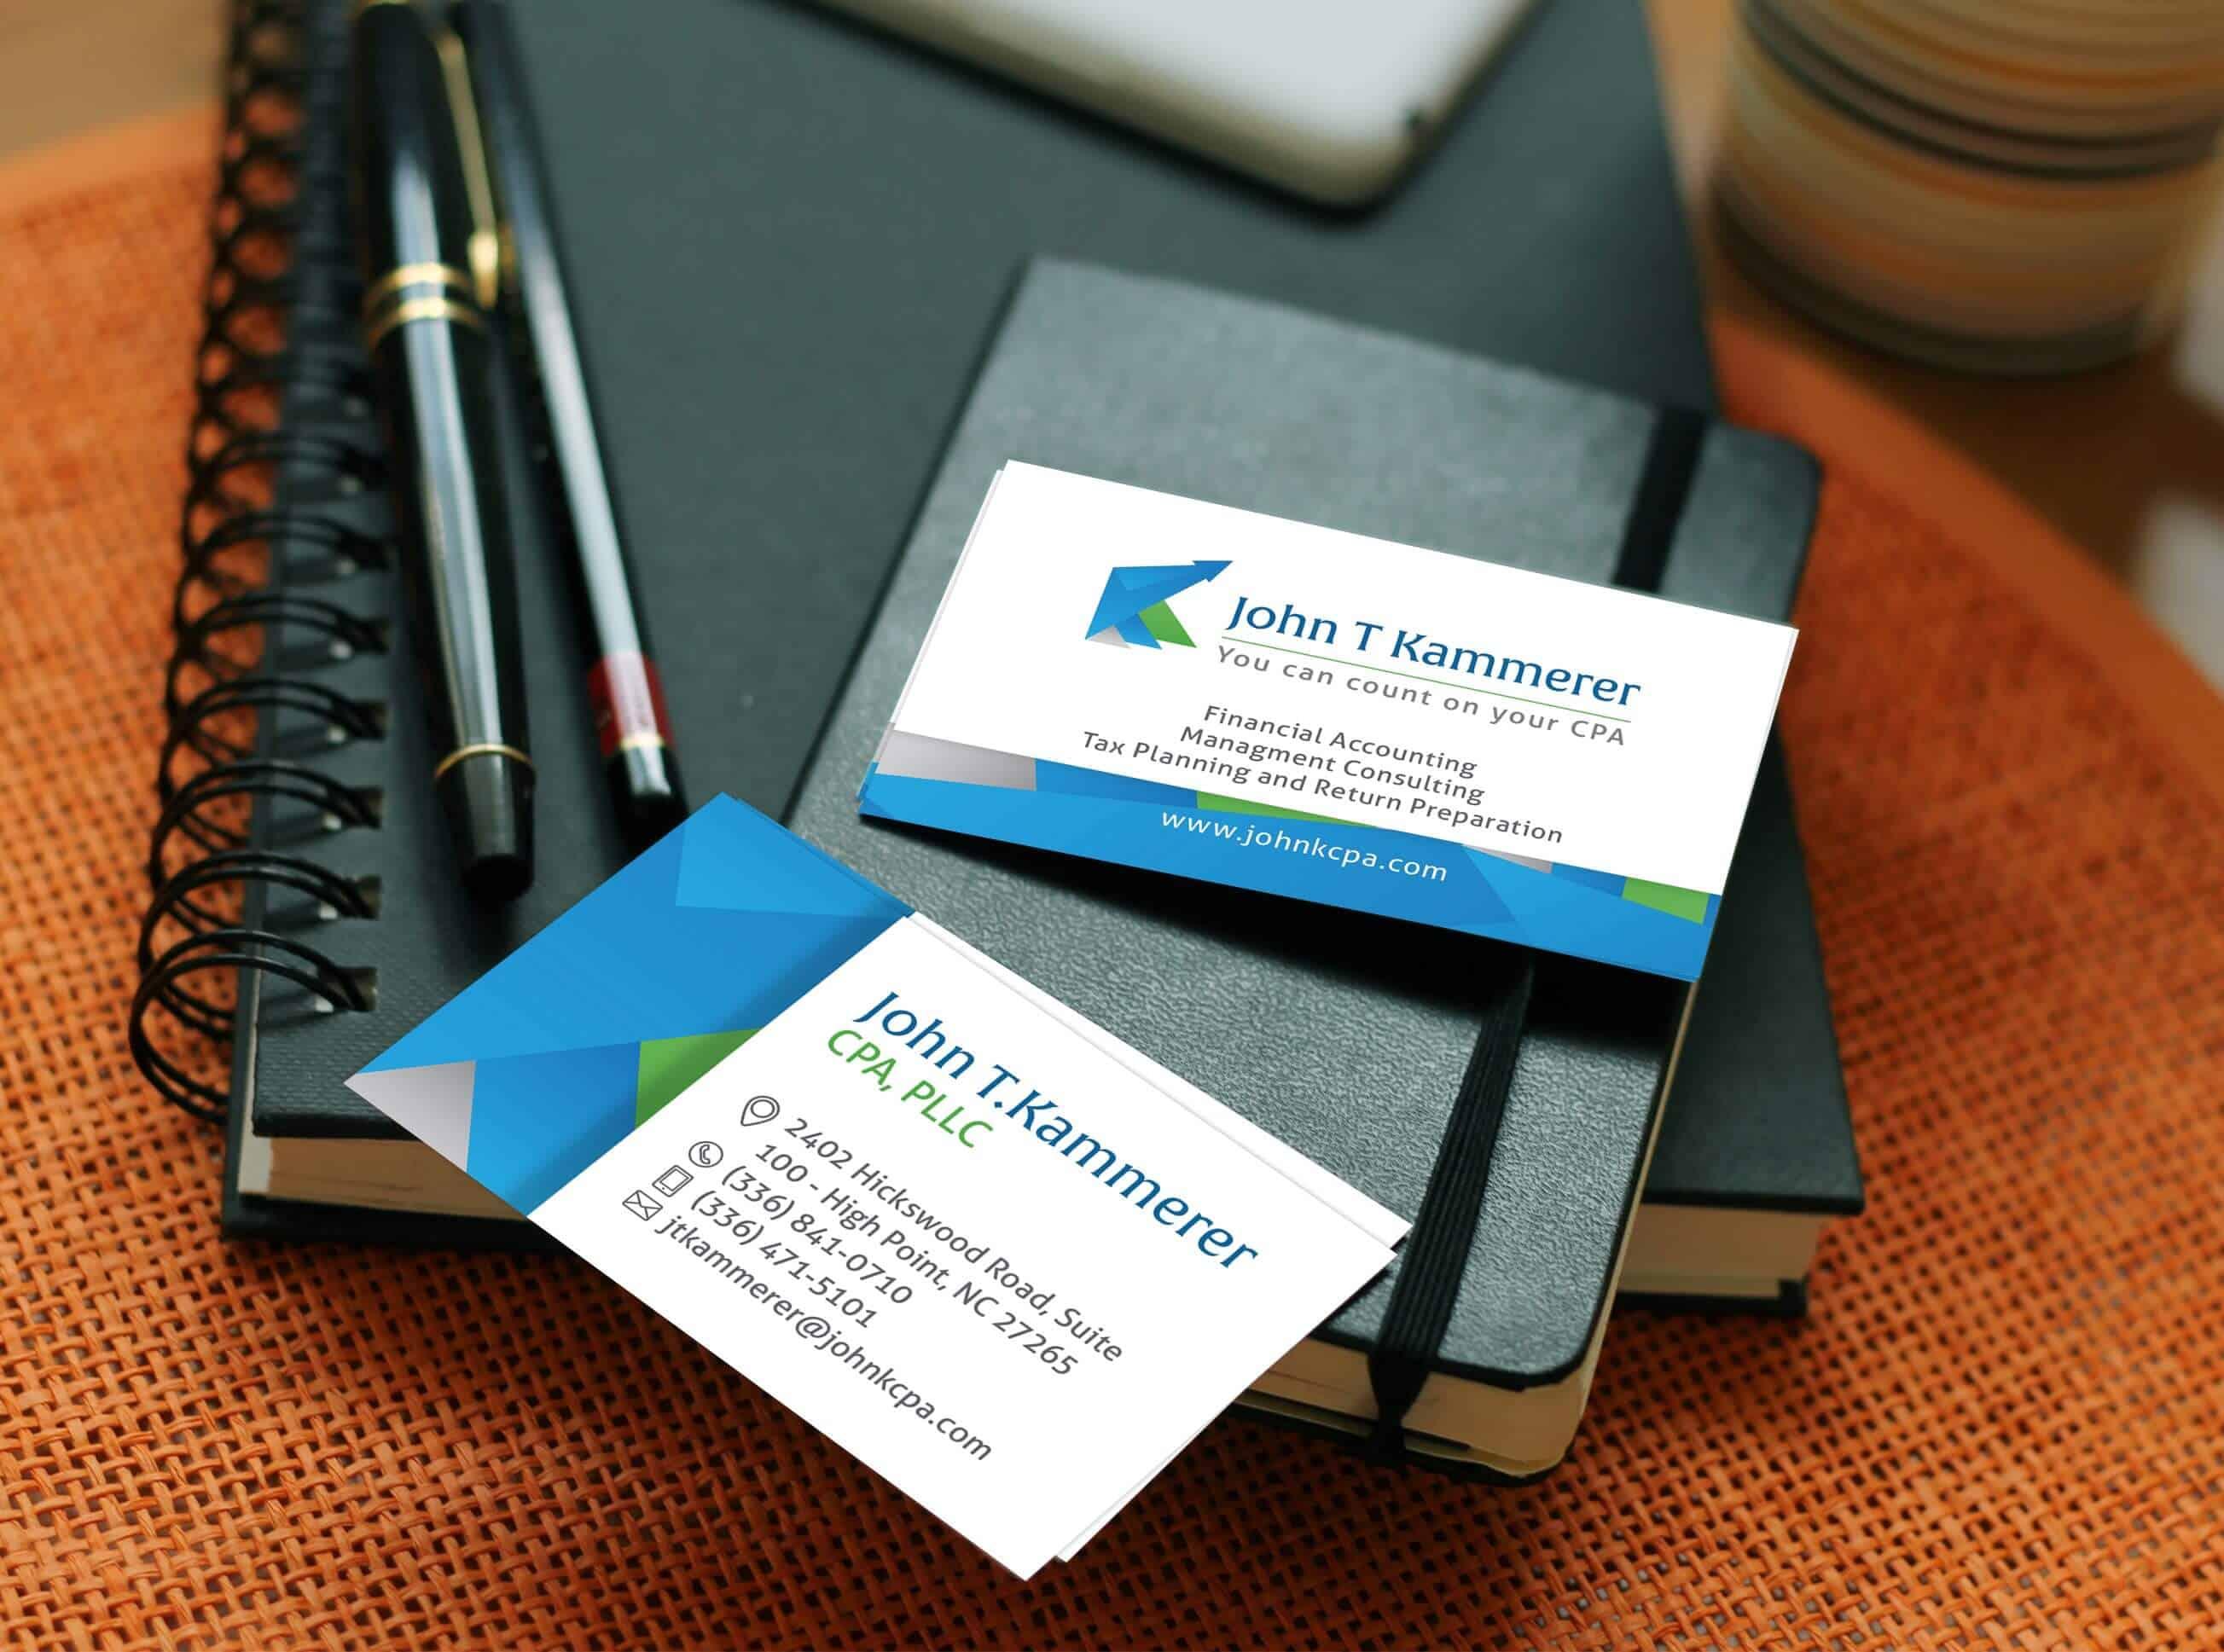 John T Kammerer Accountant – Business Card design